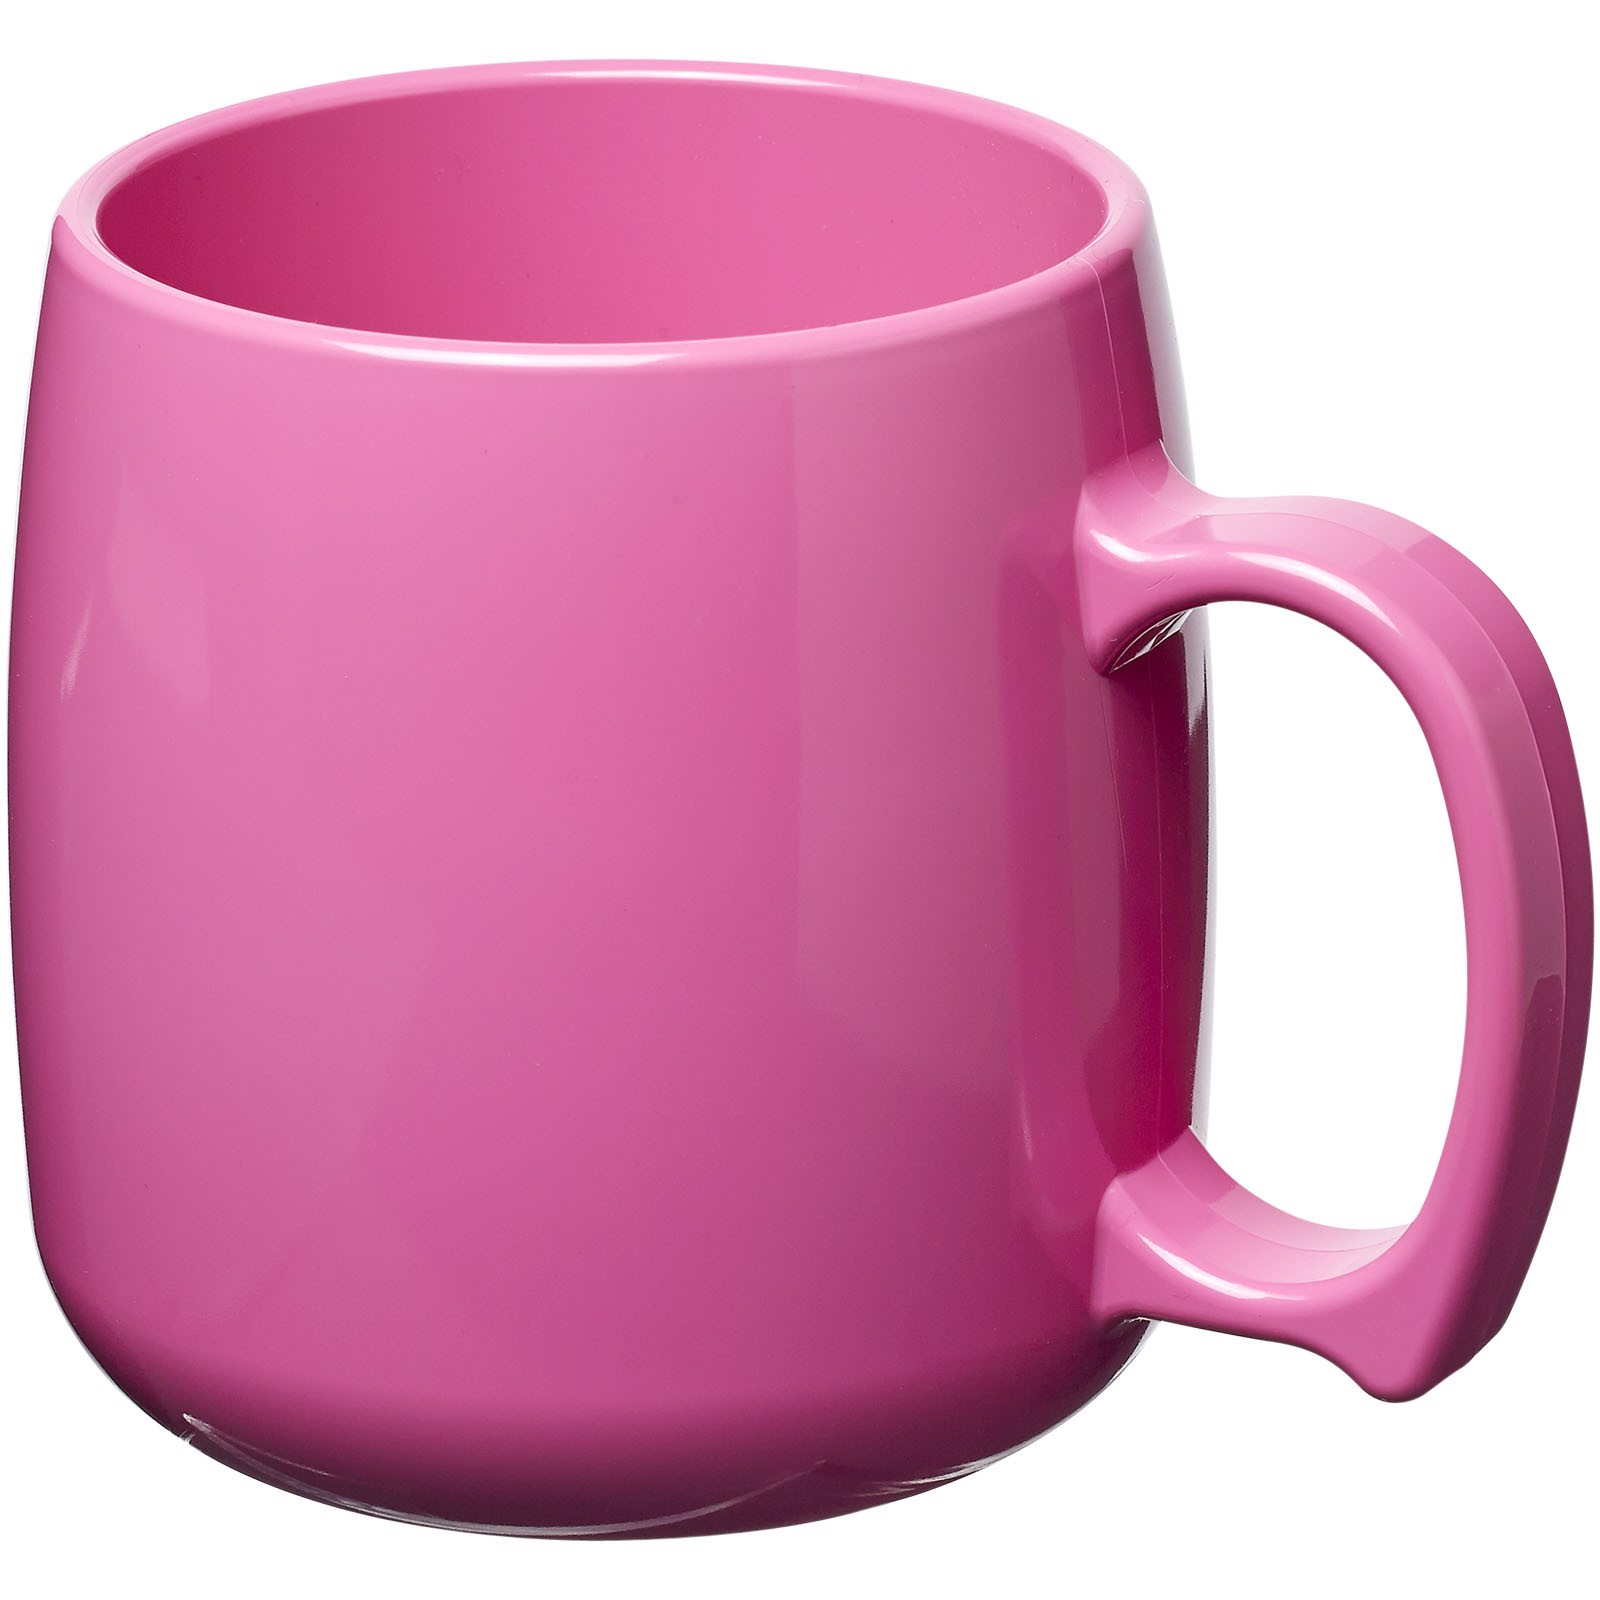 Classic 300 ml plastic mug - Magenta